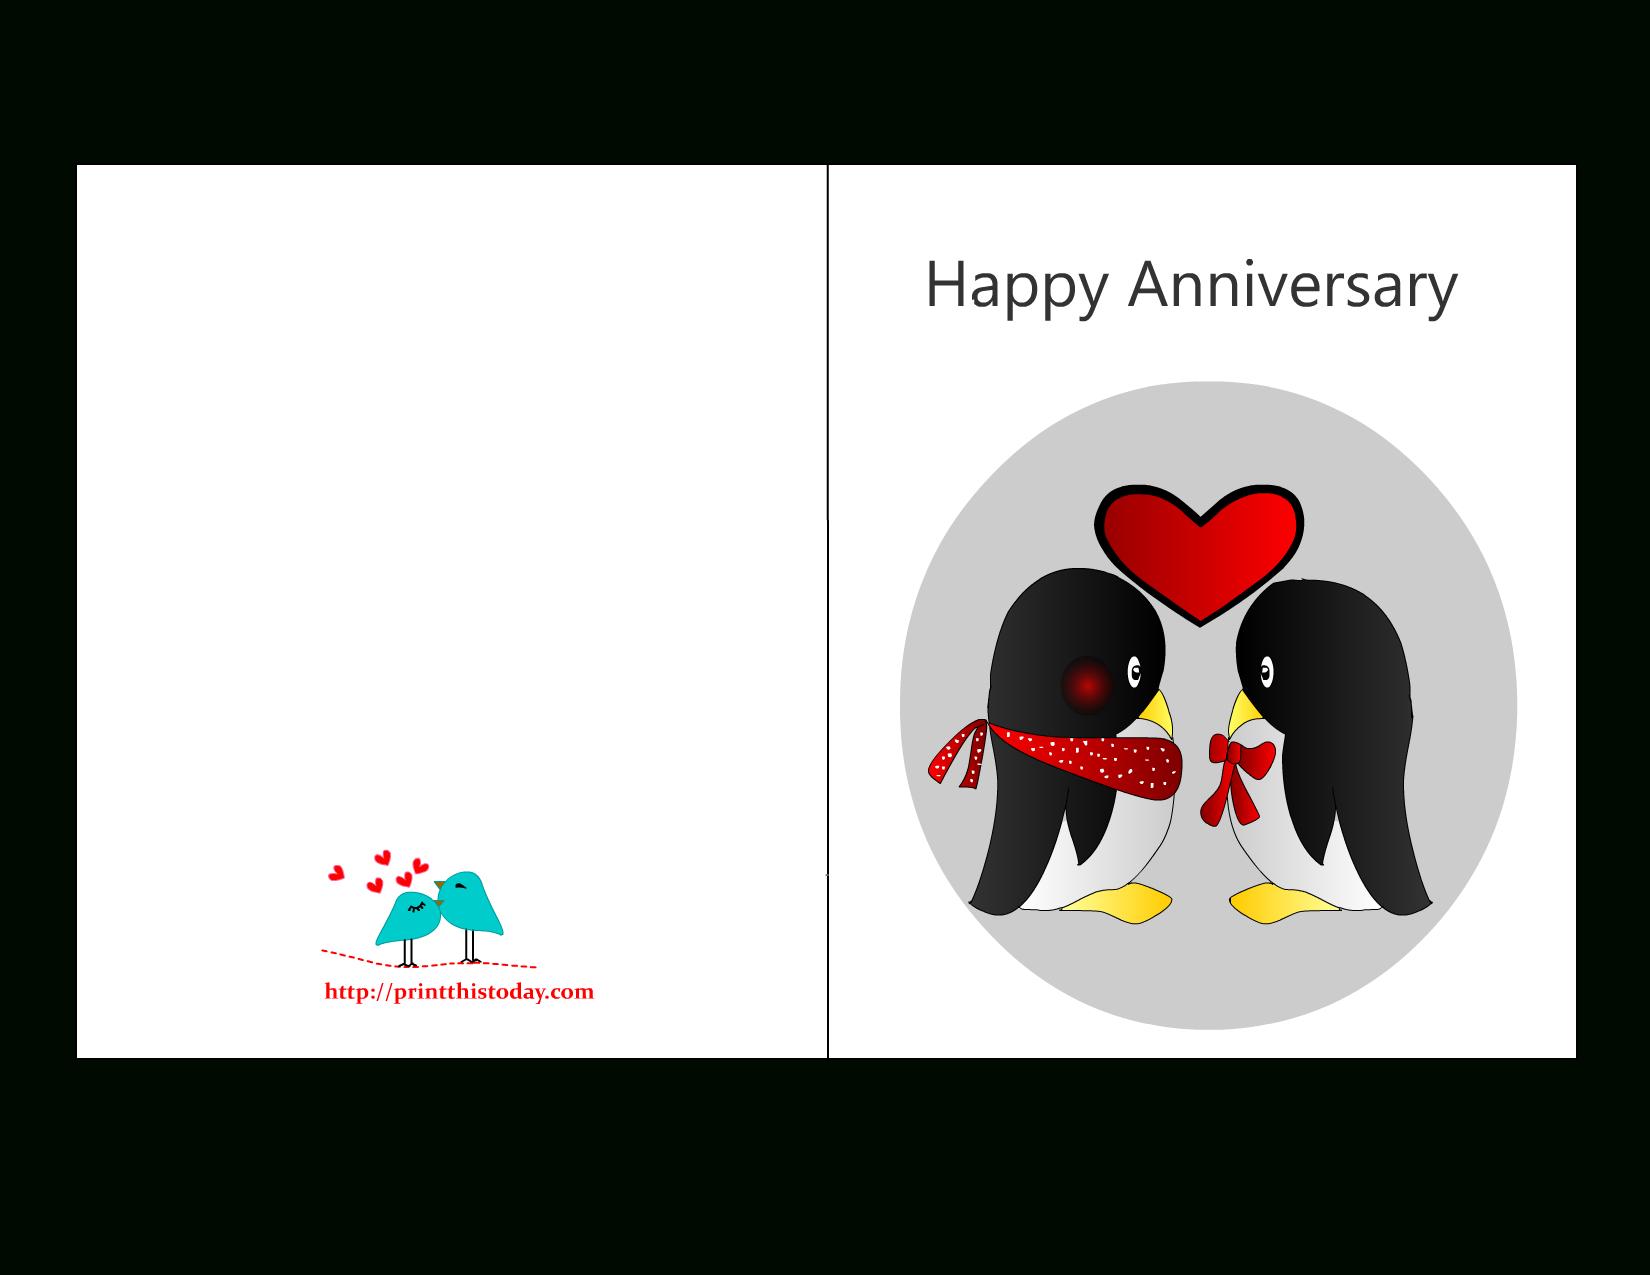 Anniversary Card Templates 12 Free - Anniversary Card Intended For Word Anniversary Card Template